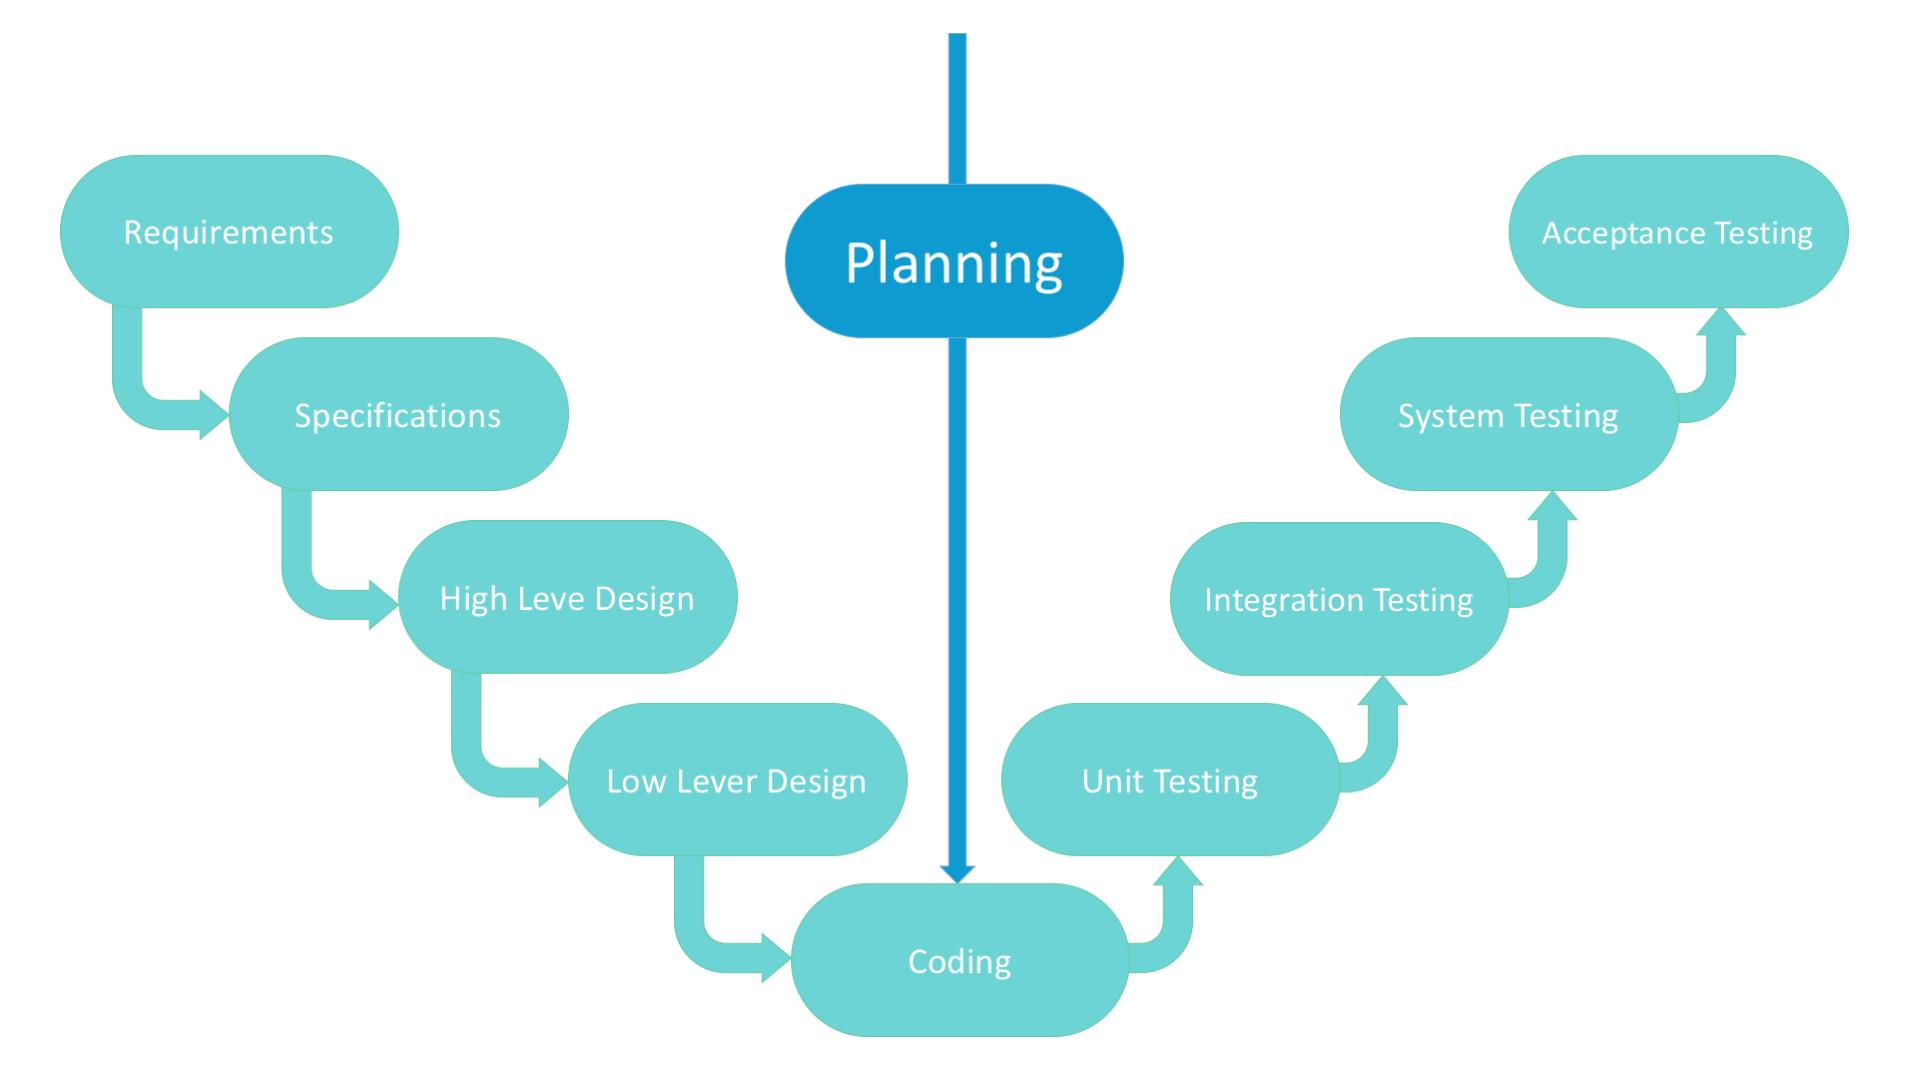 v-shaped SDLC model scheme